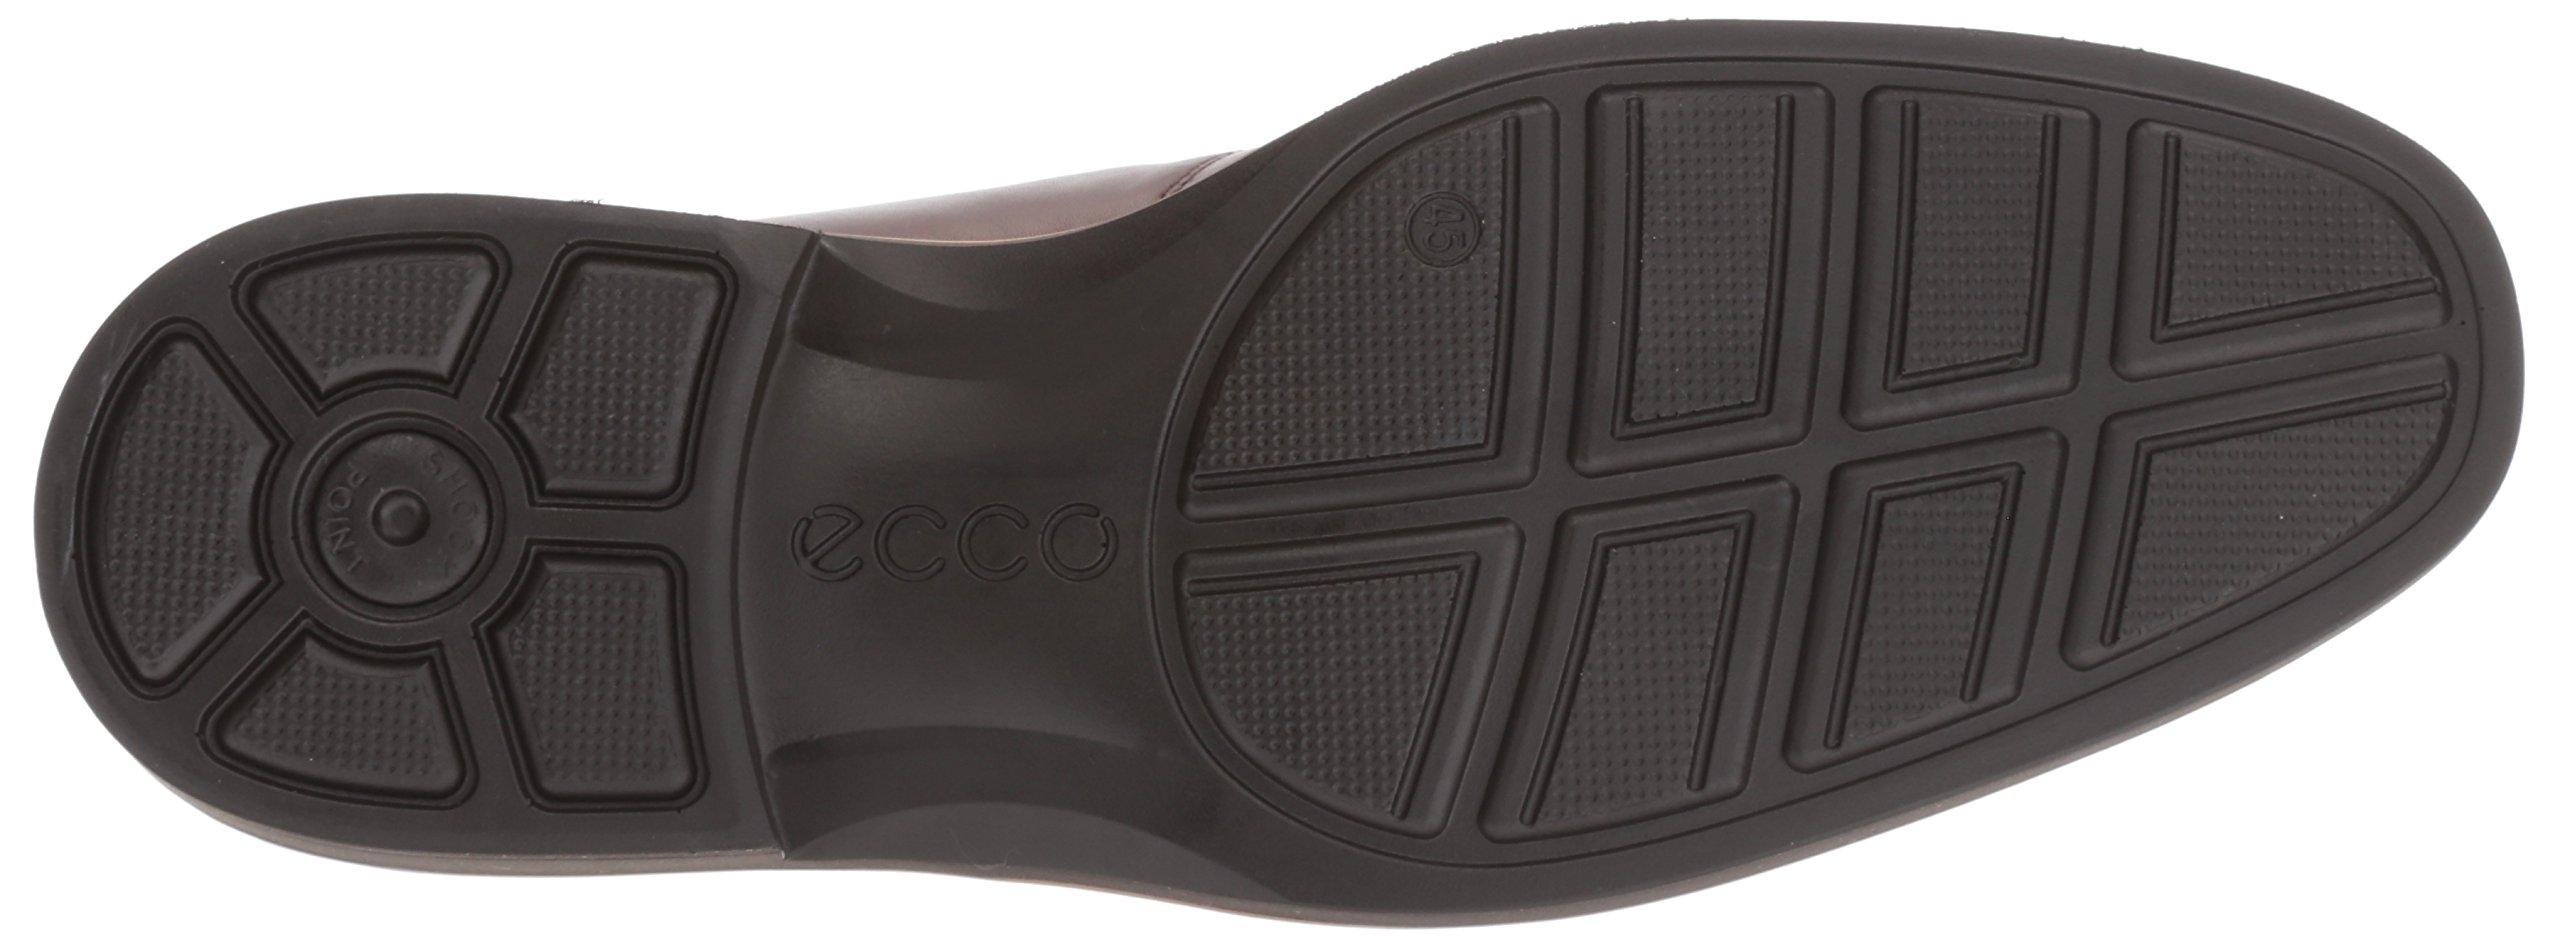 ECCO Men's Biarritz Modern Chukka Boot, Rust, 40 EU/7.5-8 M US by ECCO (Image #3)